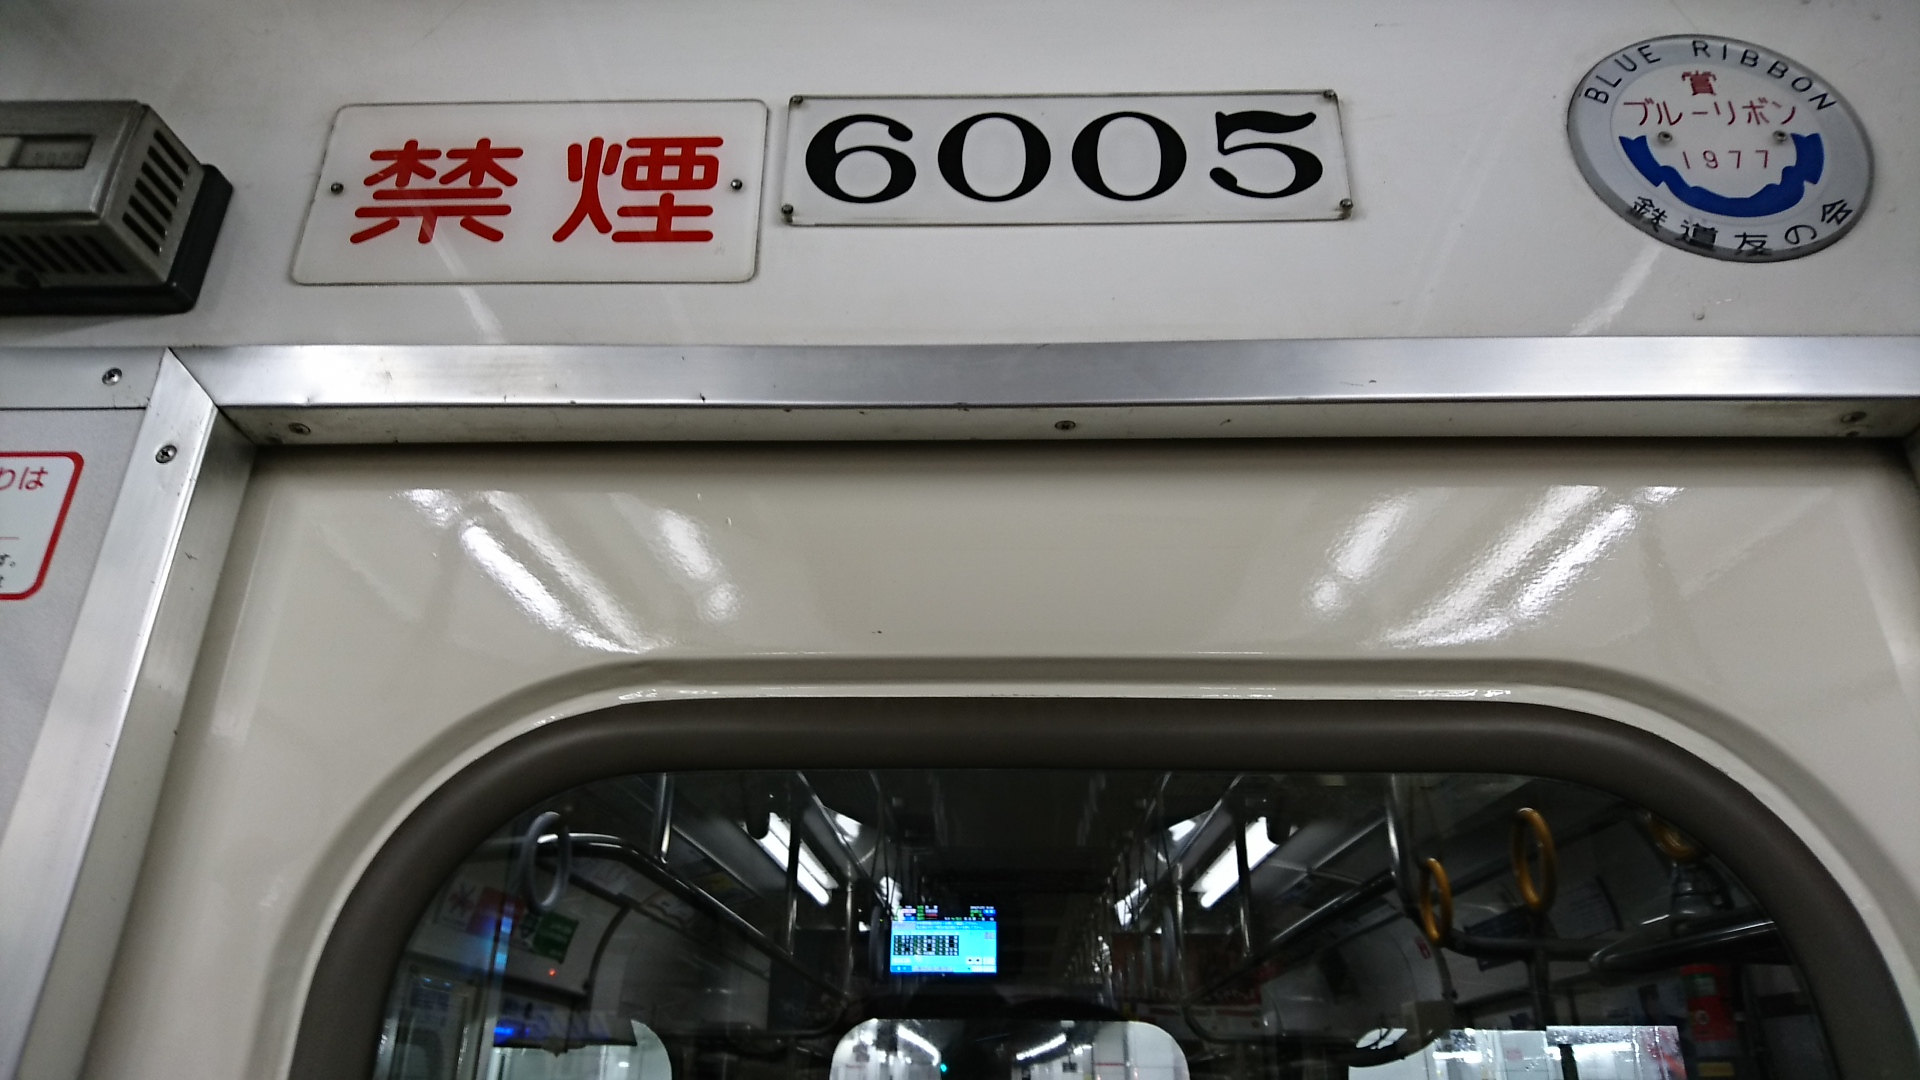 2016.11.27 名鉄 (8) 名古屋 - 吉良吉田いき急行(6005)1920-1080